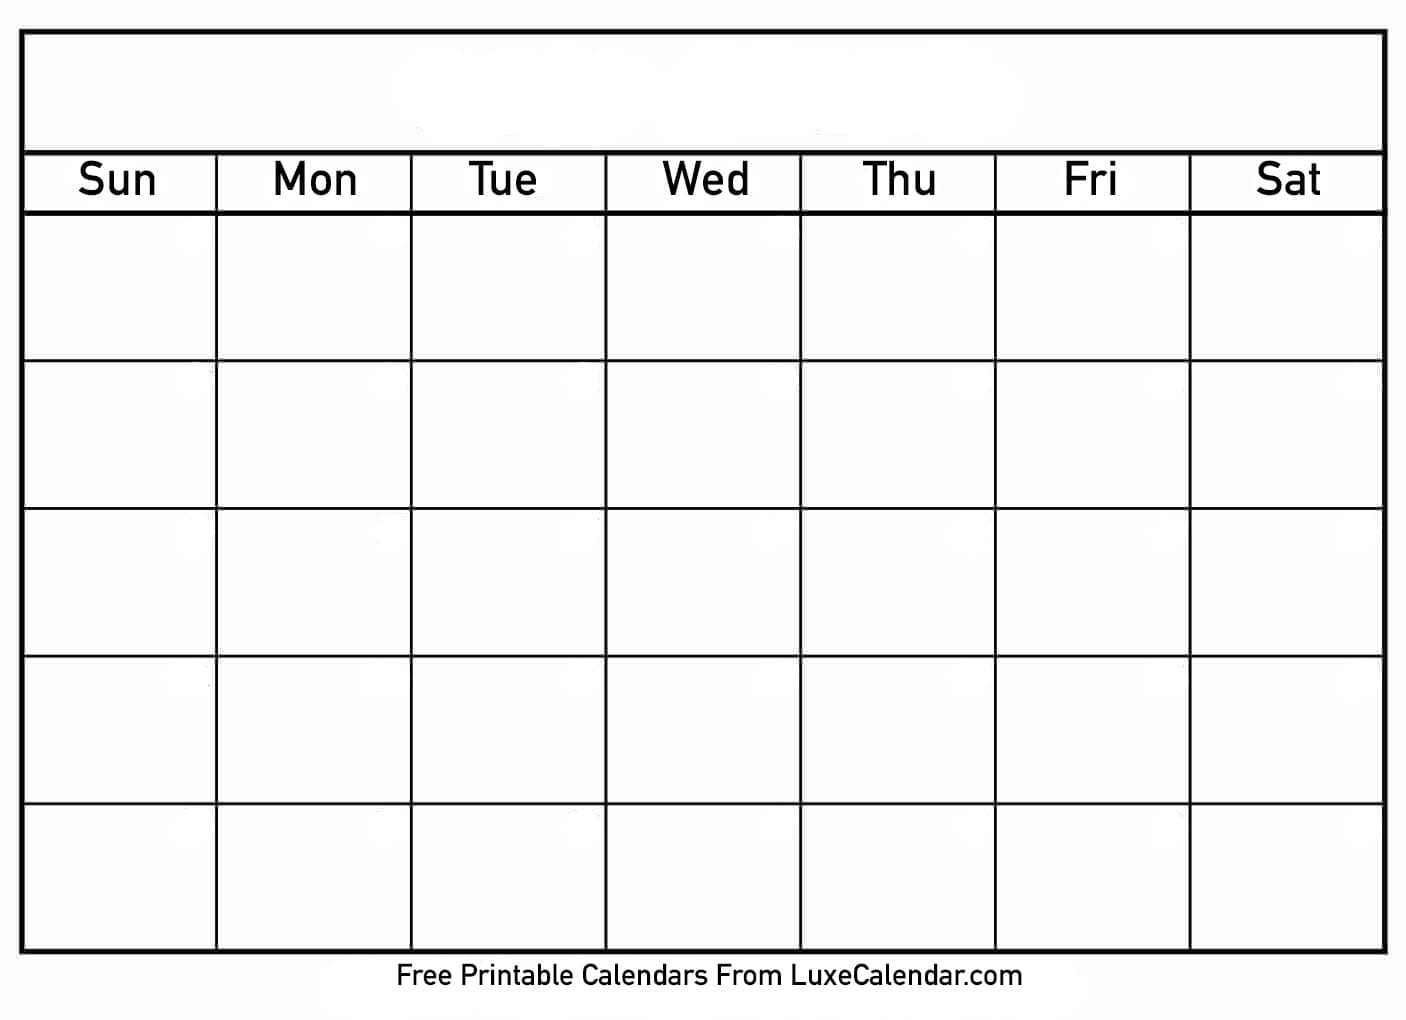 Blank Printable Calendar - Luxe Calendar in Blank Calendar To Fill In